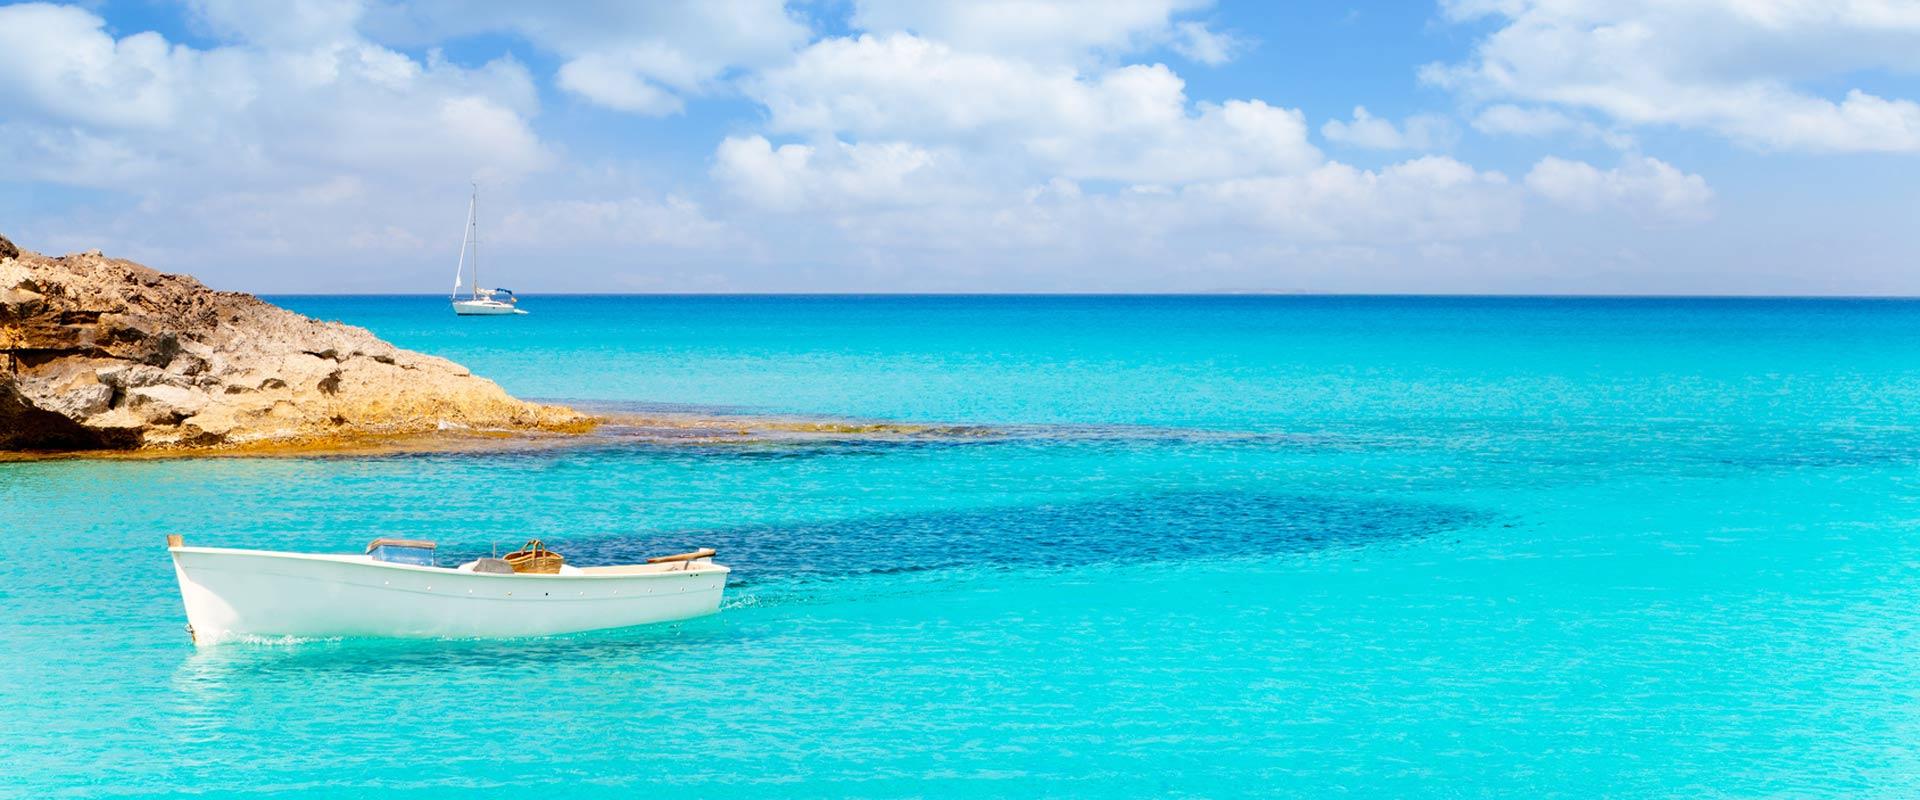 Viajes a Formentera